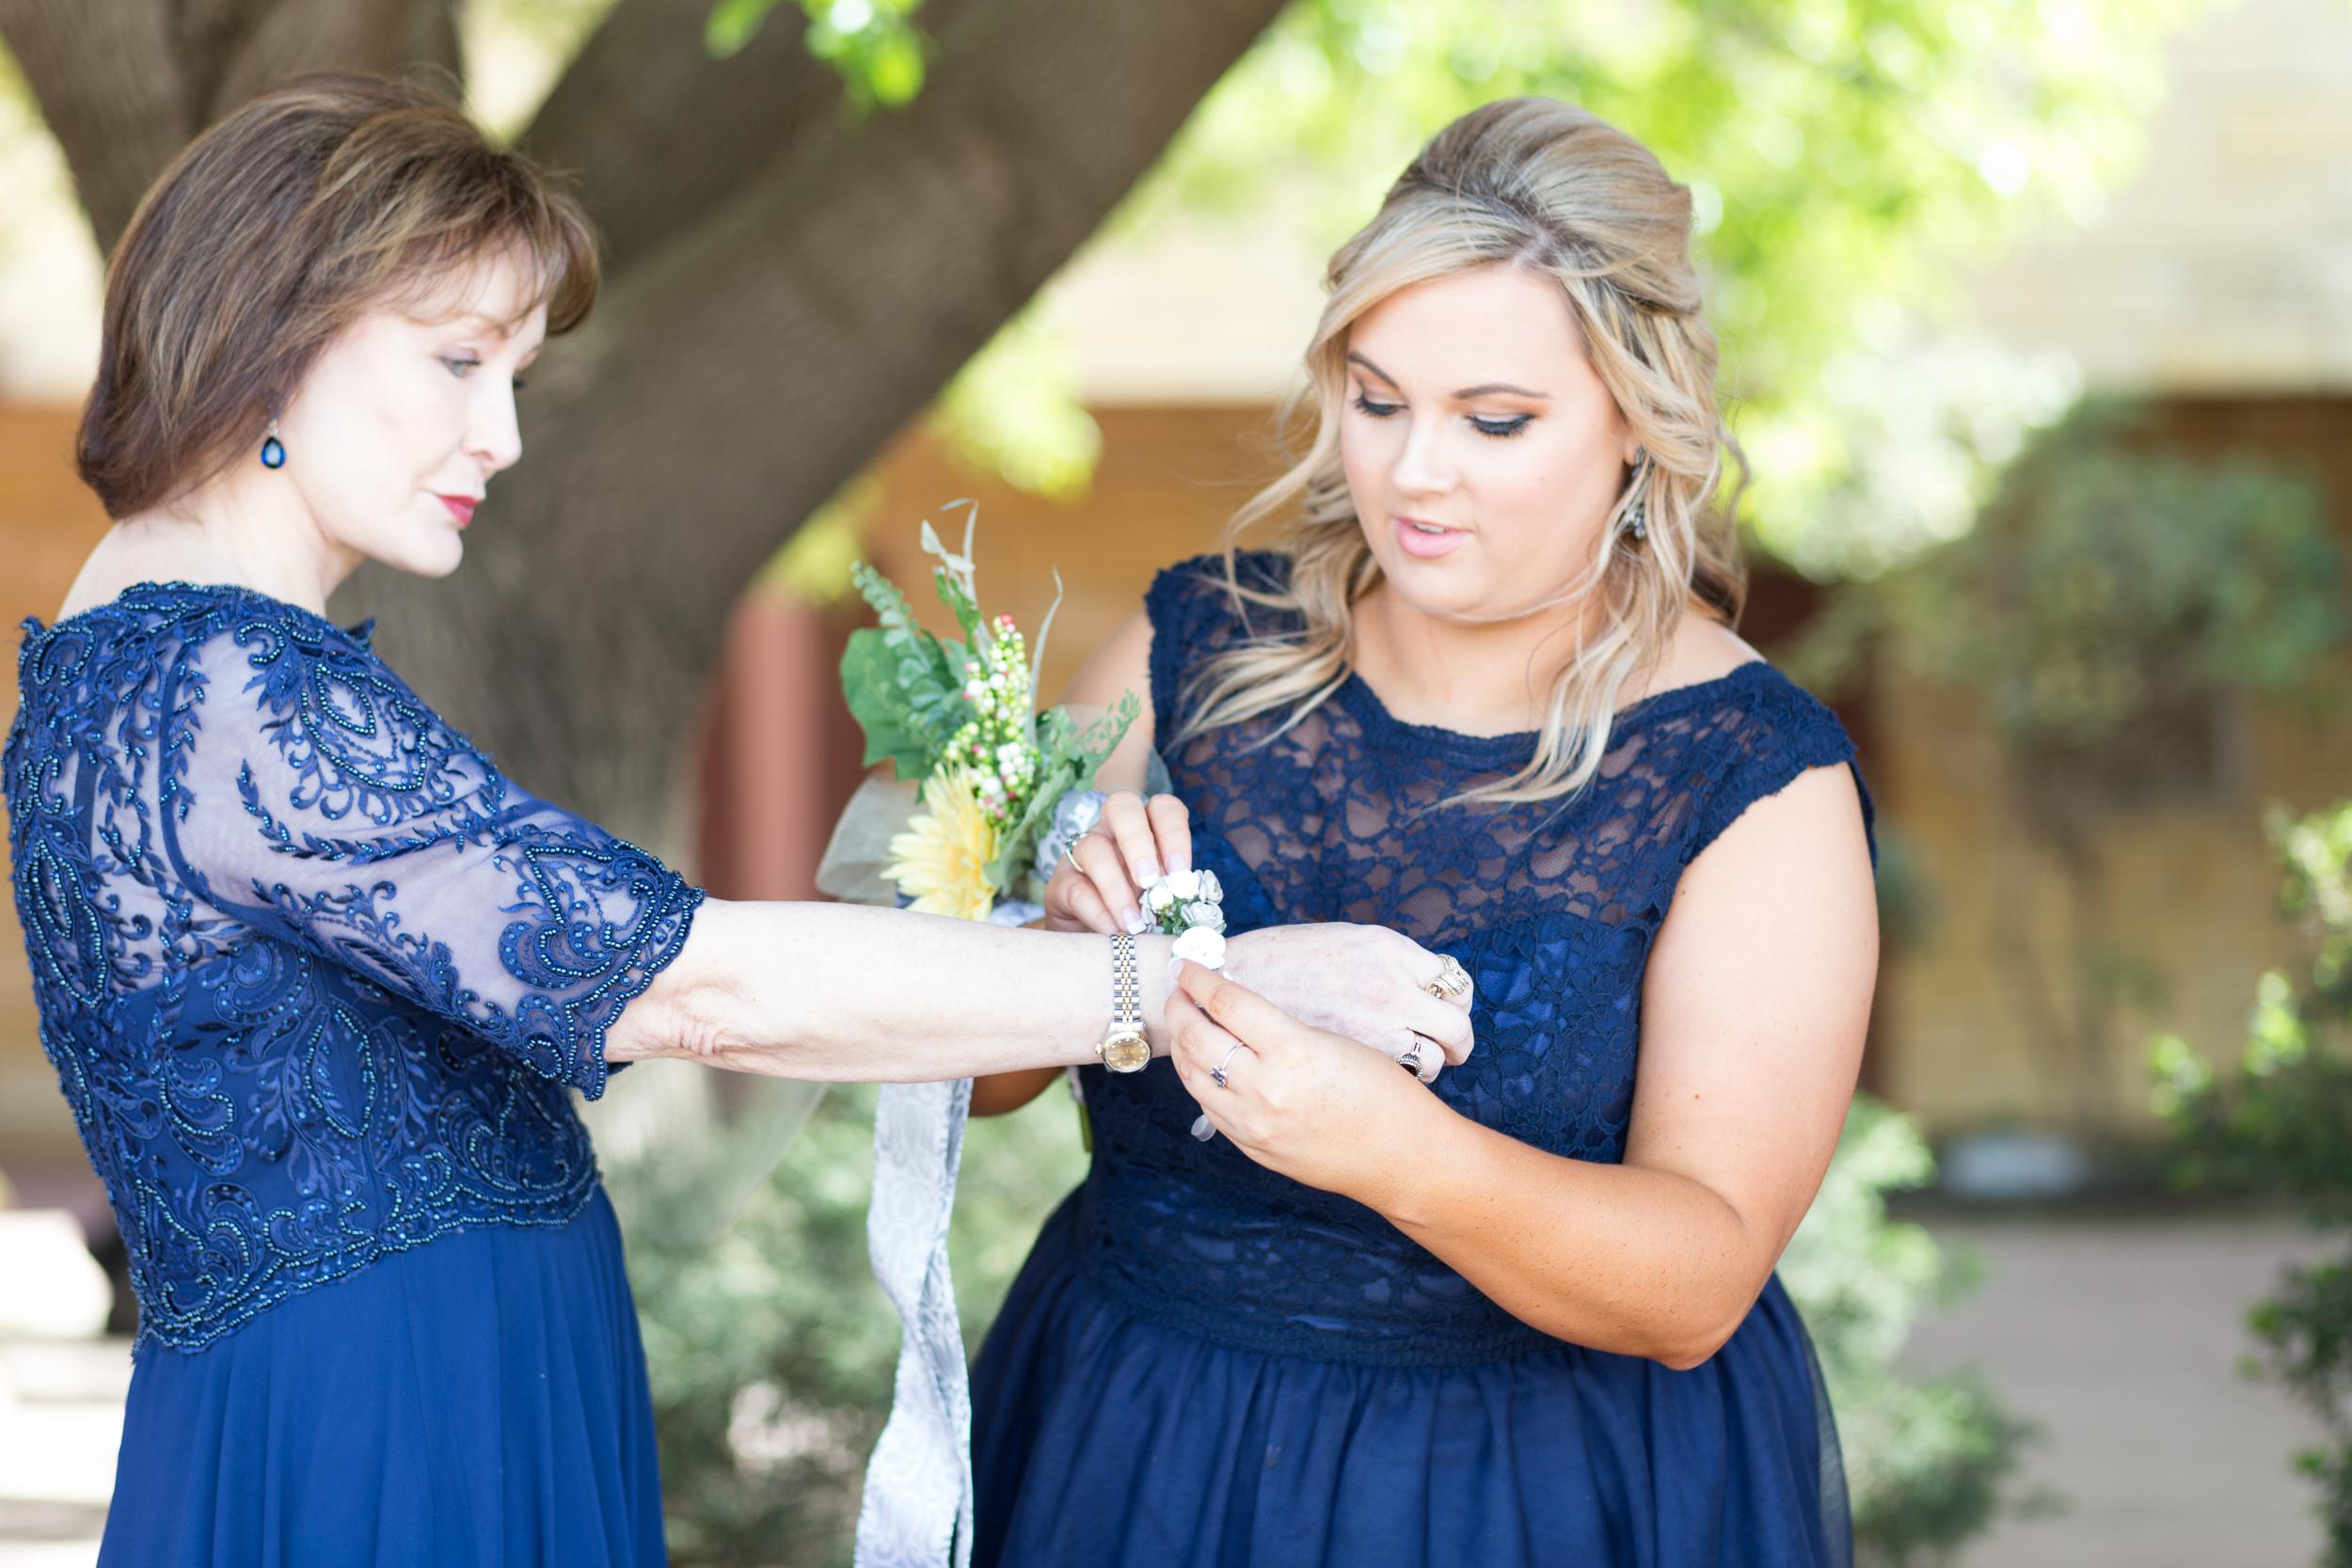 hall_wedding blog_kelsie hendricks photography_odessa_ west texas-38.jpg